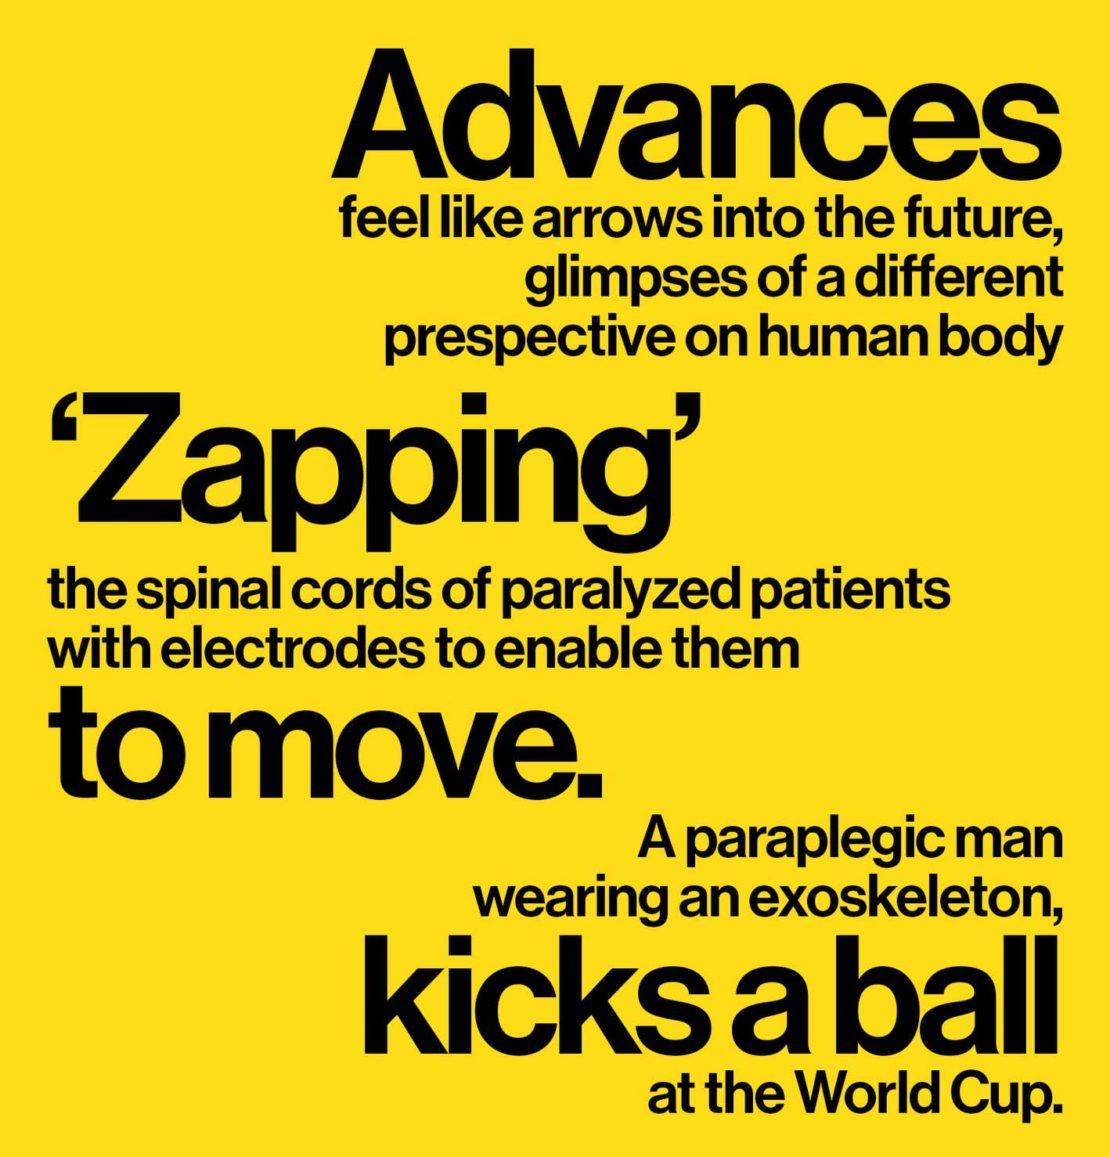 Text: Advances feel like arrows into the future